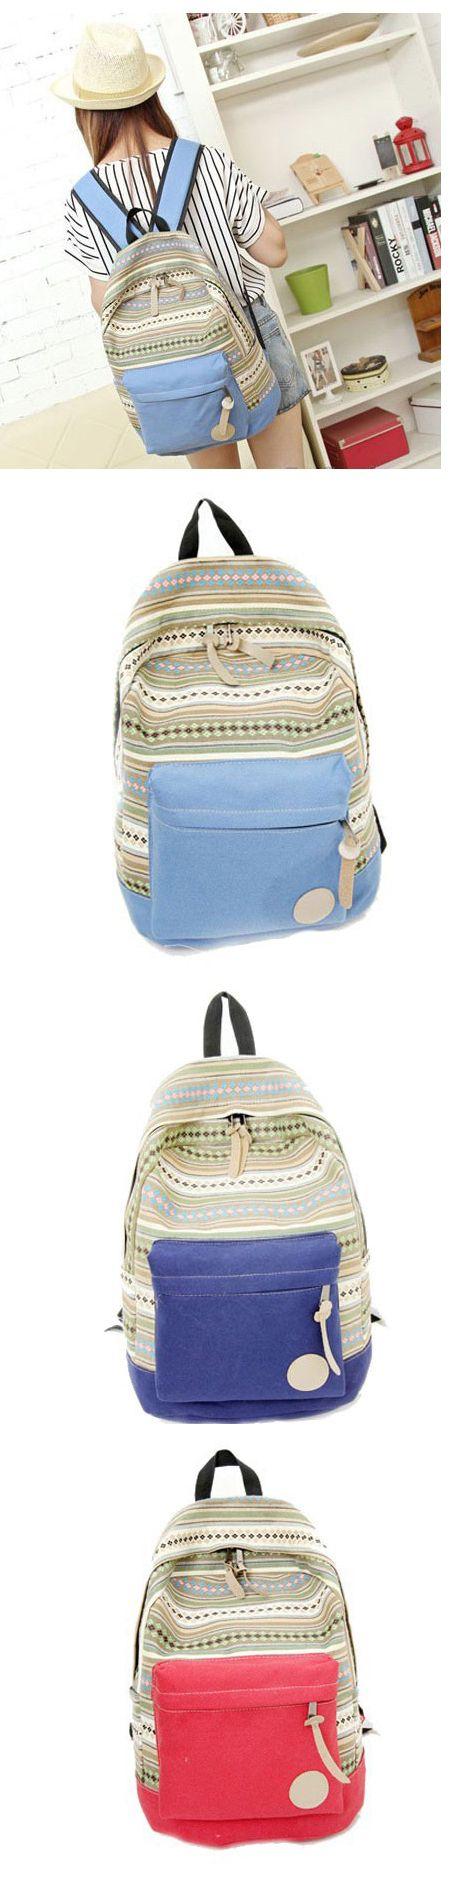 2017 New Arrival Fresh Folk Geometry Striped Canvas College Backpack, backpacks for girls, backpack purse, pink backpack, mini backpack, cool backpacks, backpacks for women, leather backpack, travel backpack, laptop backpack, school backpacks